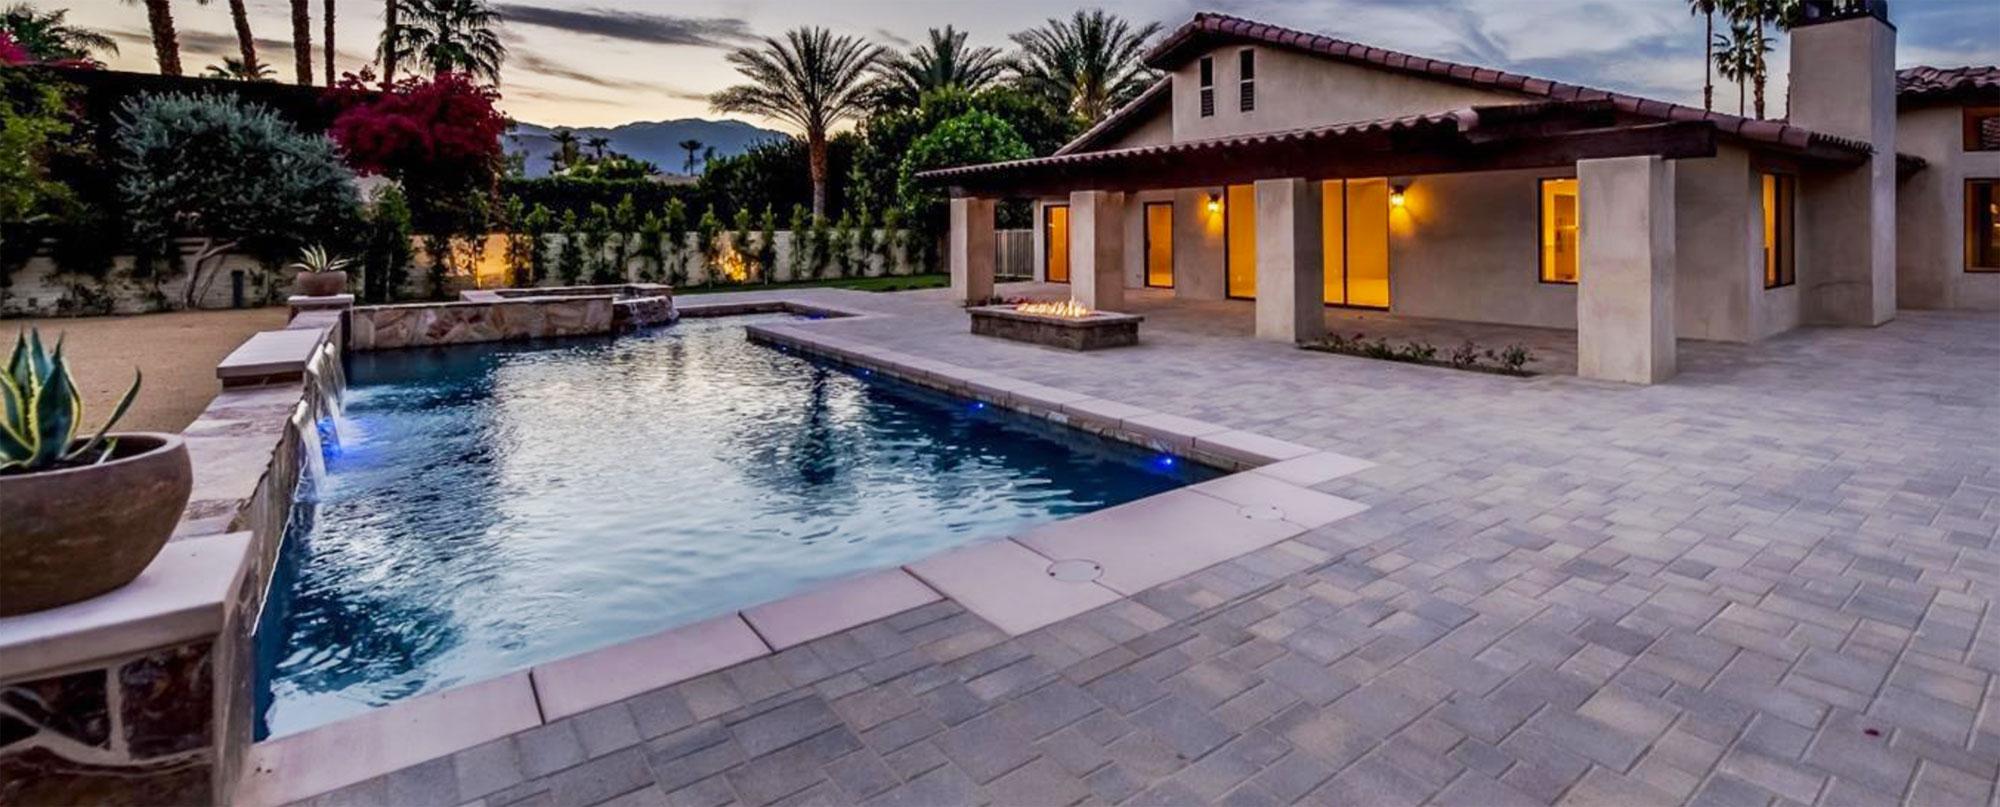 Pool Construction Rancho Mirage, California